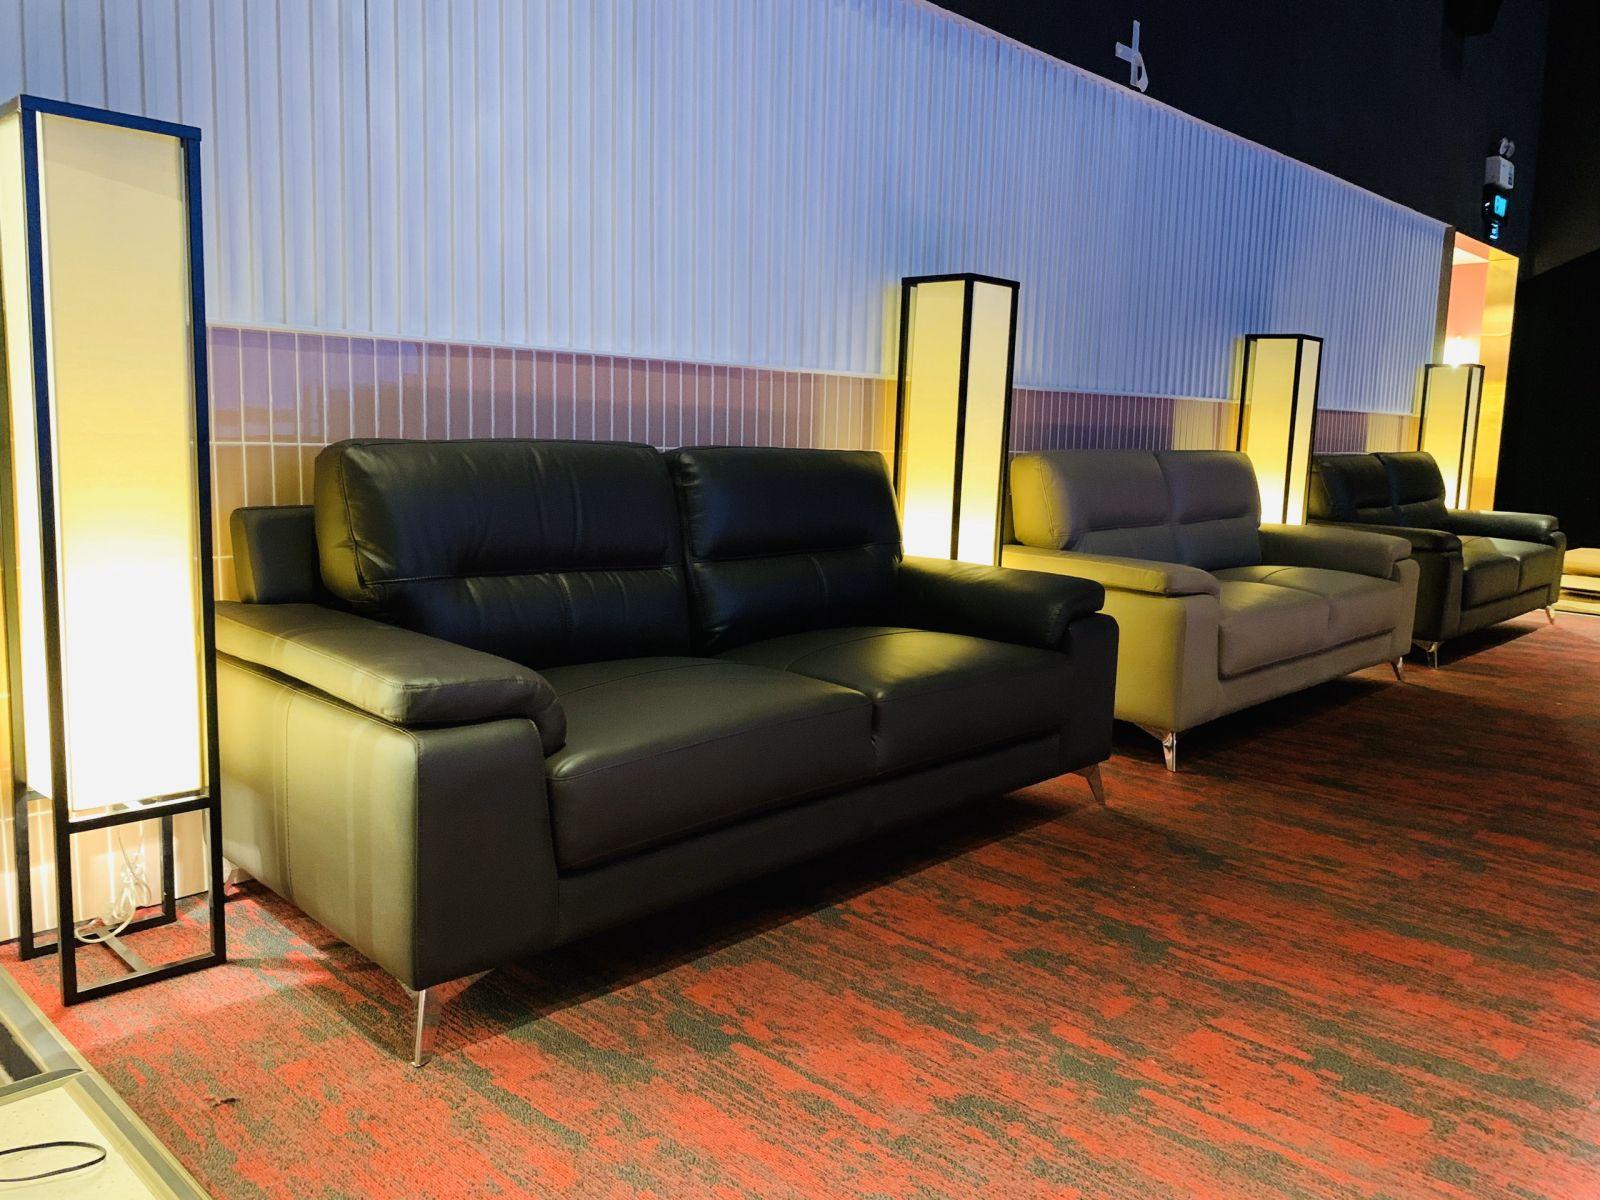 sofa da malaysia 100%